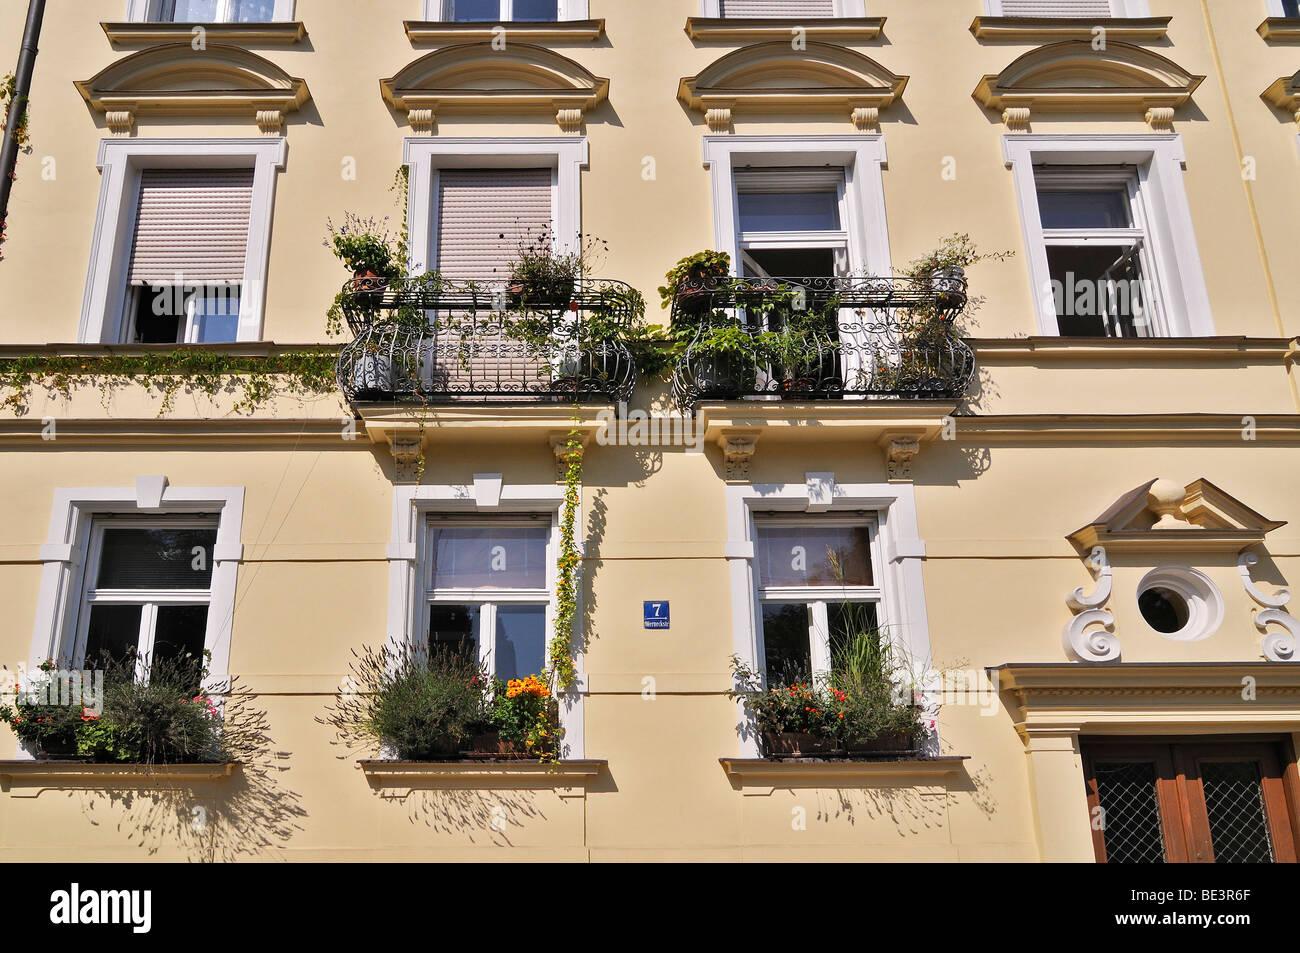 Werneckstrasse street, facade with leafy balconies, Schwabing, Munich, Bavaria, Germany, Europe - Stock Image